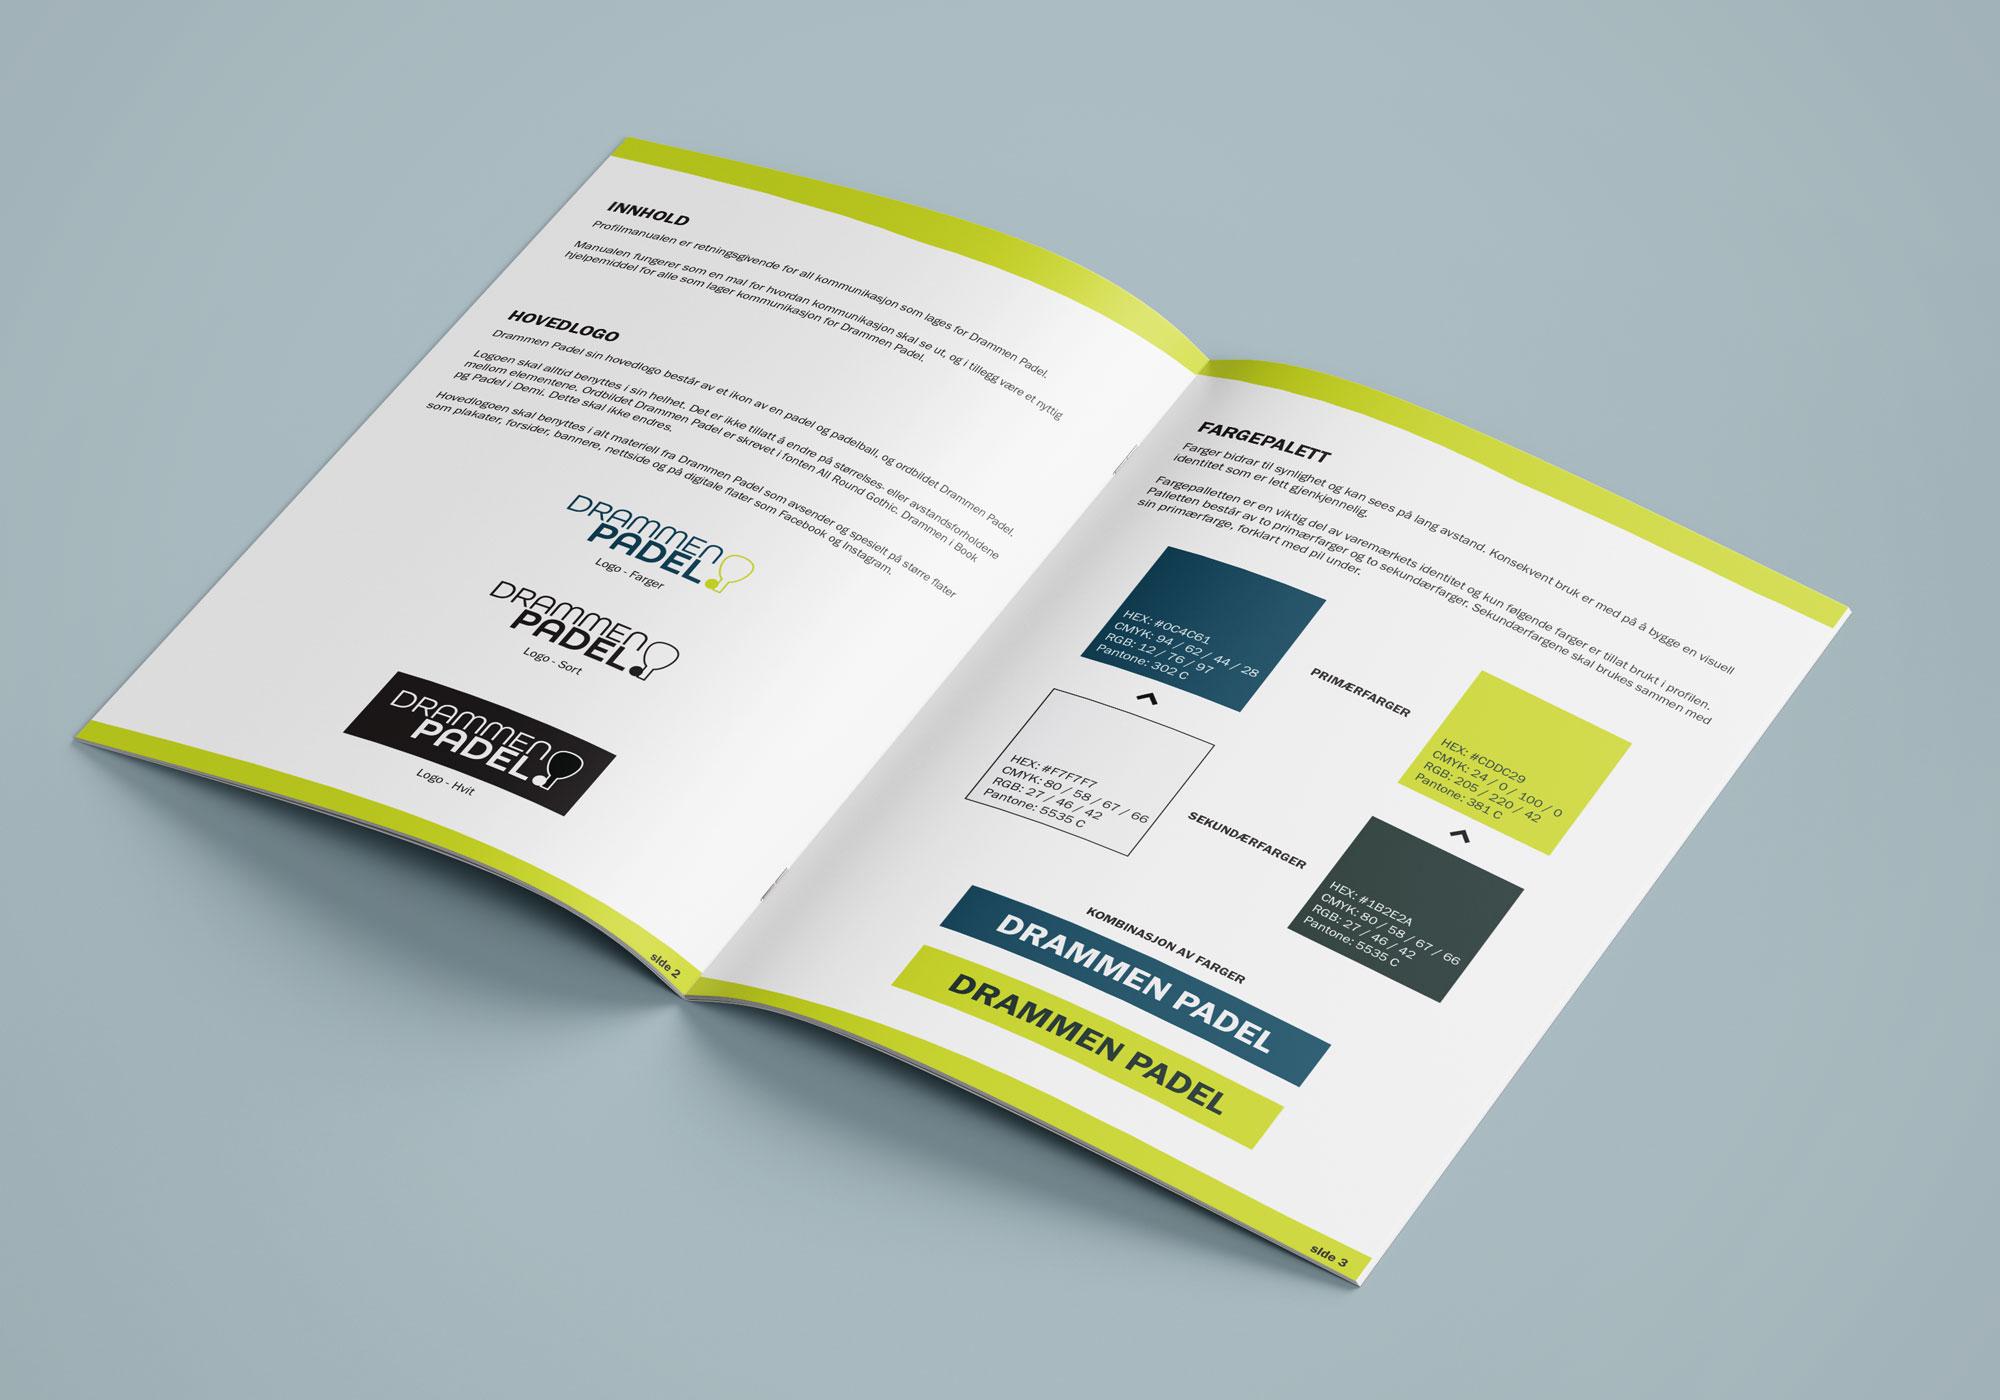 Profilhåndbok for Drammen Padel